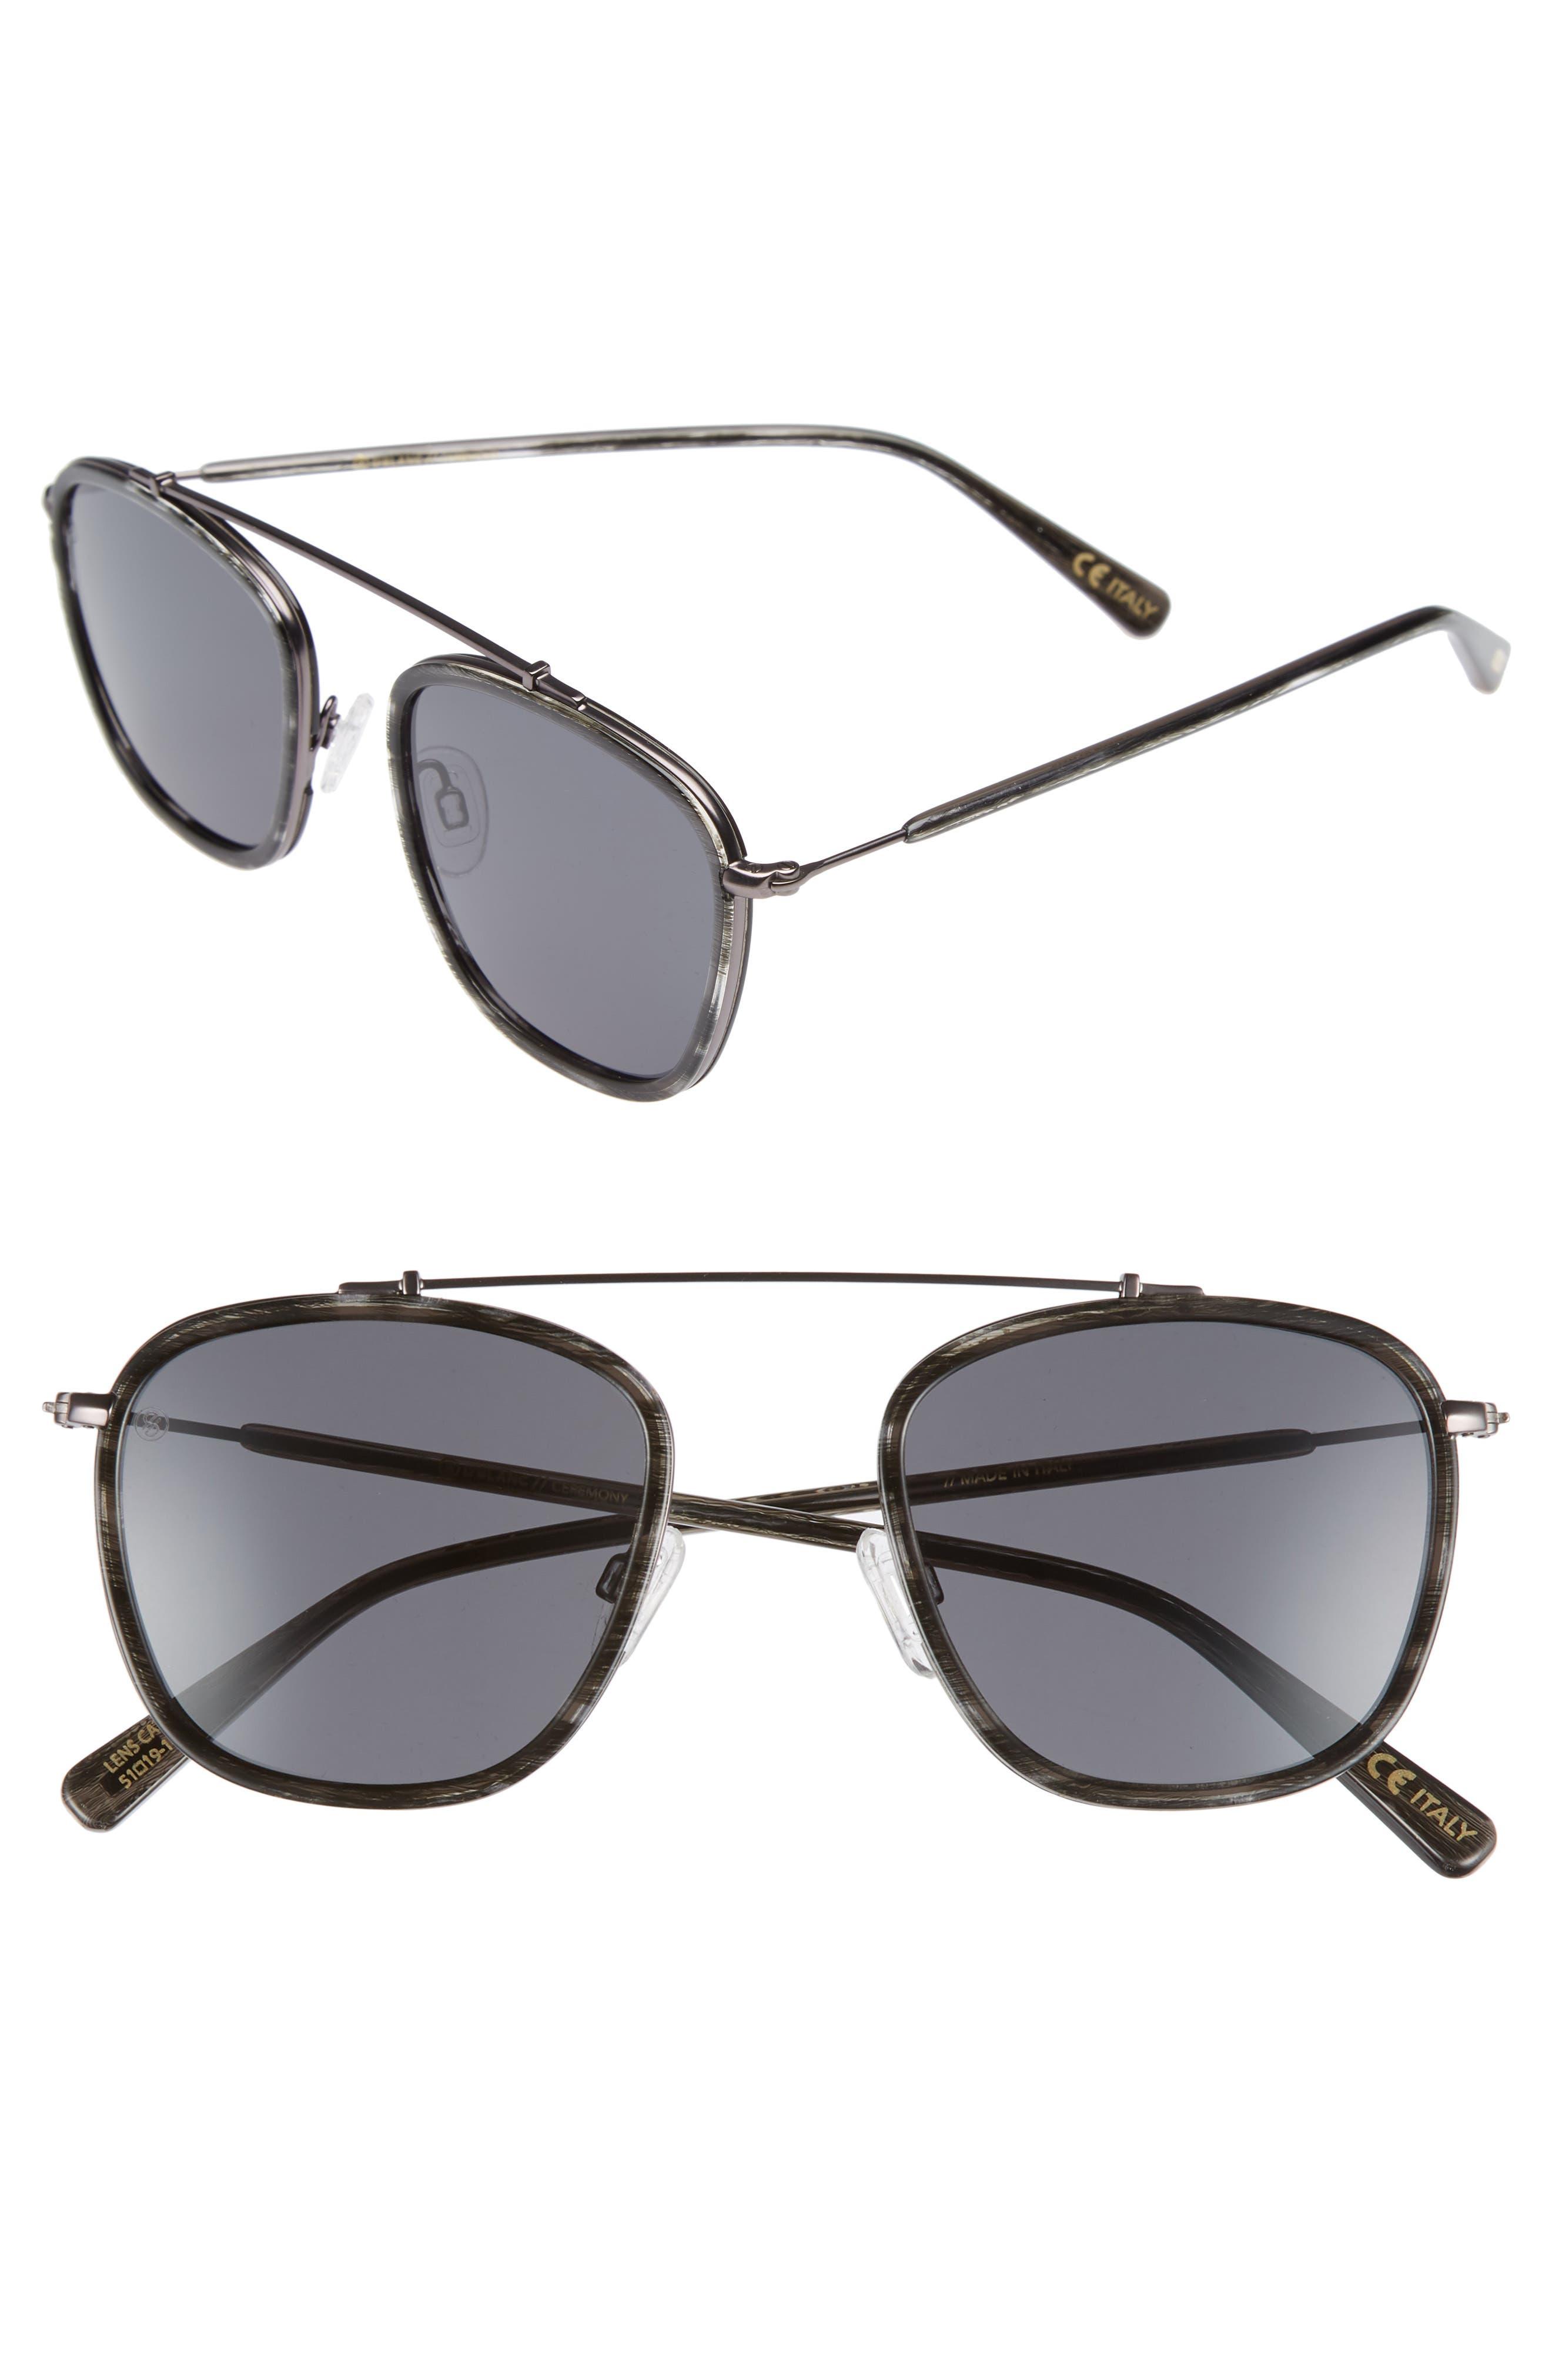 D'BLANC Ceremony 51mm Square Sunglasses,                             Main thumbnail 1, color,                             Charcoal Etch/ Grey